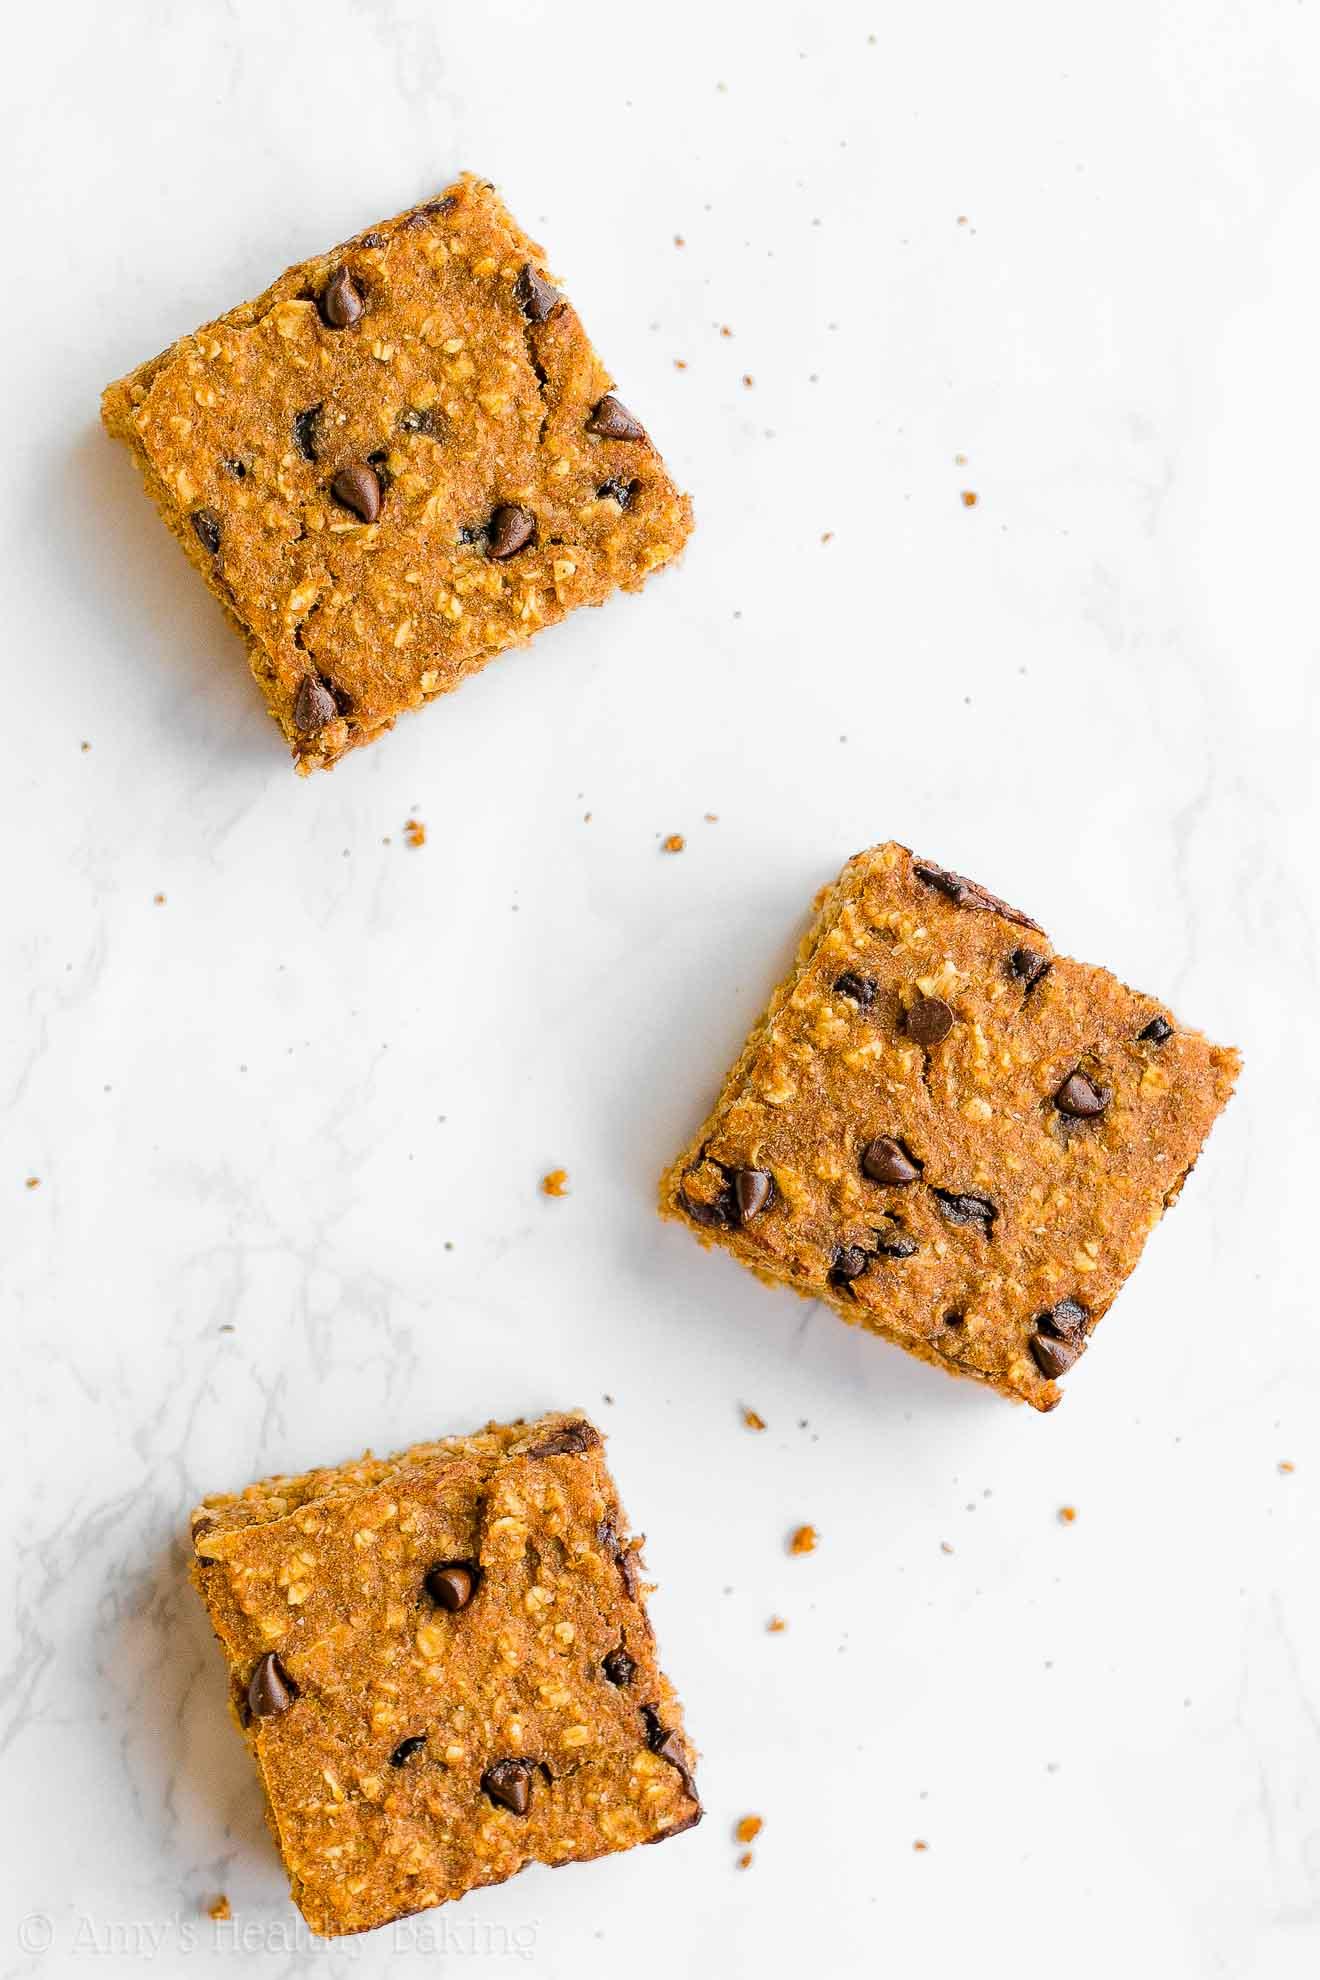 Easy Healthy Clean Eating Moist Pumpkin Chocolate Chip Oatmeal Snack Cake